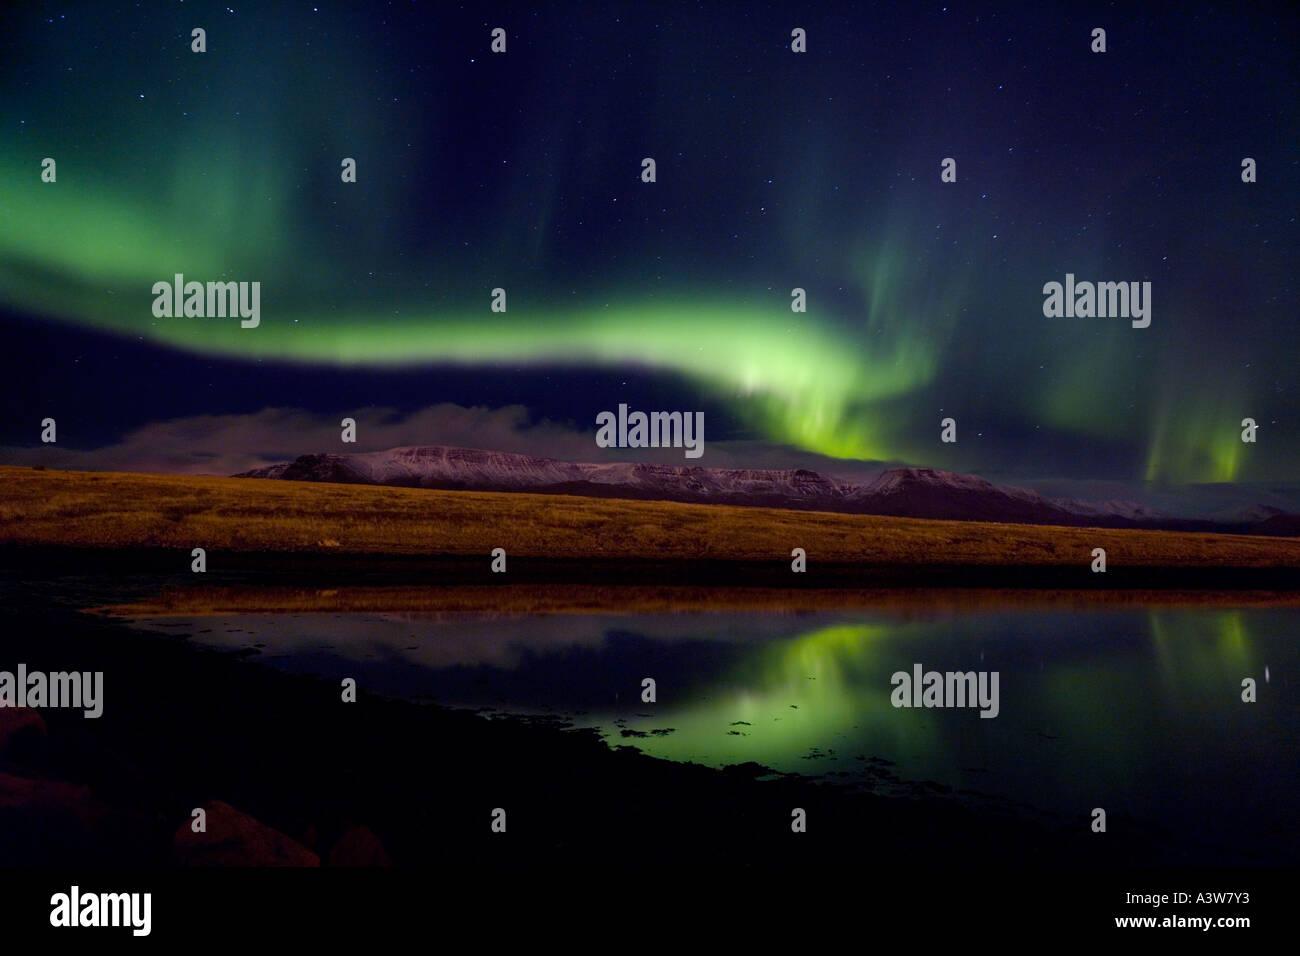 Aurora Borealis, Northern Lights, Iceland, Mt Esja, Iceland Stock Photo